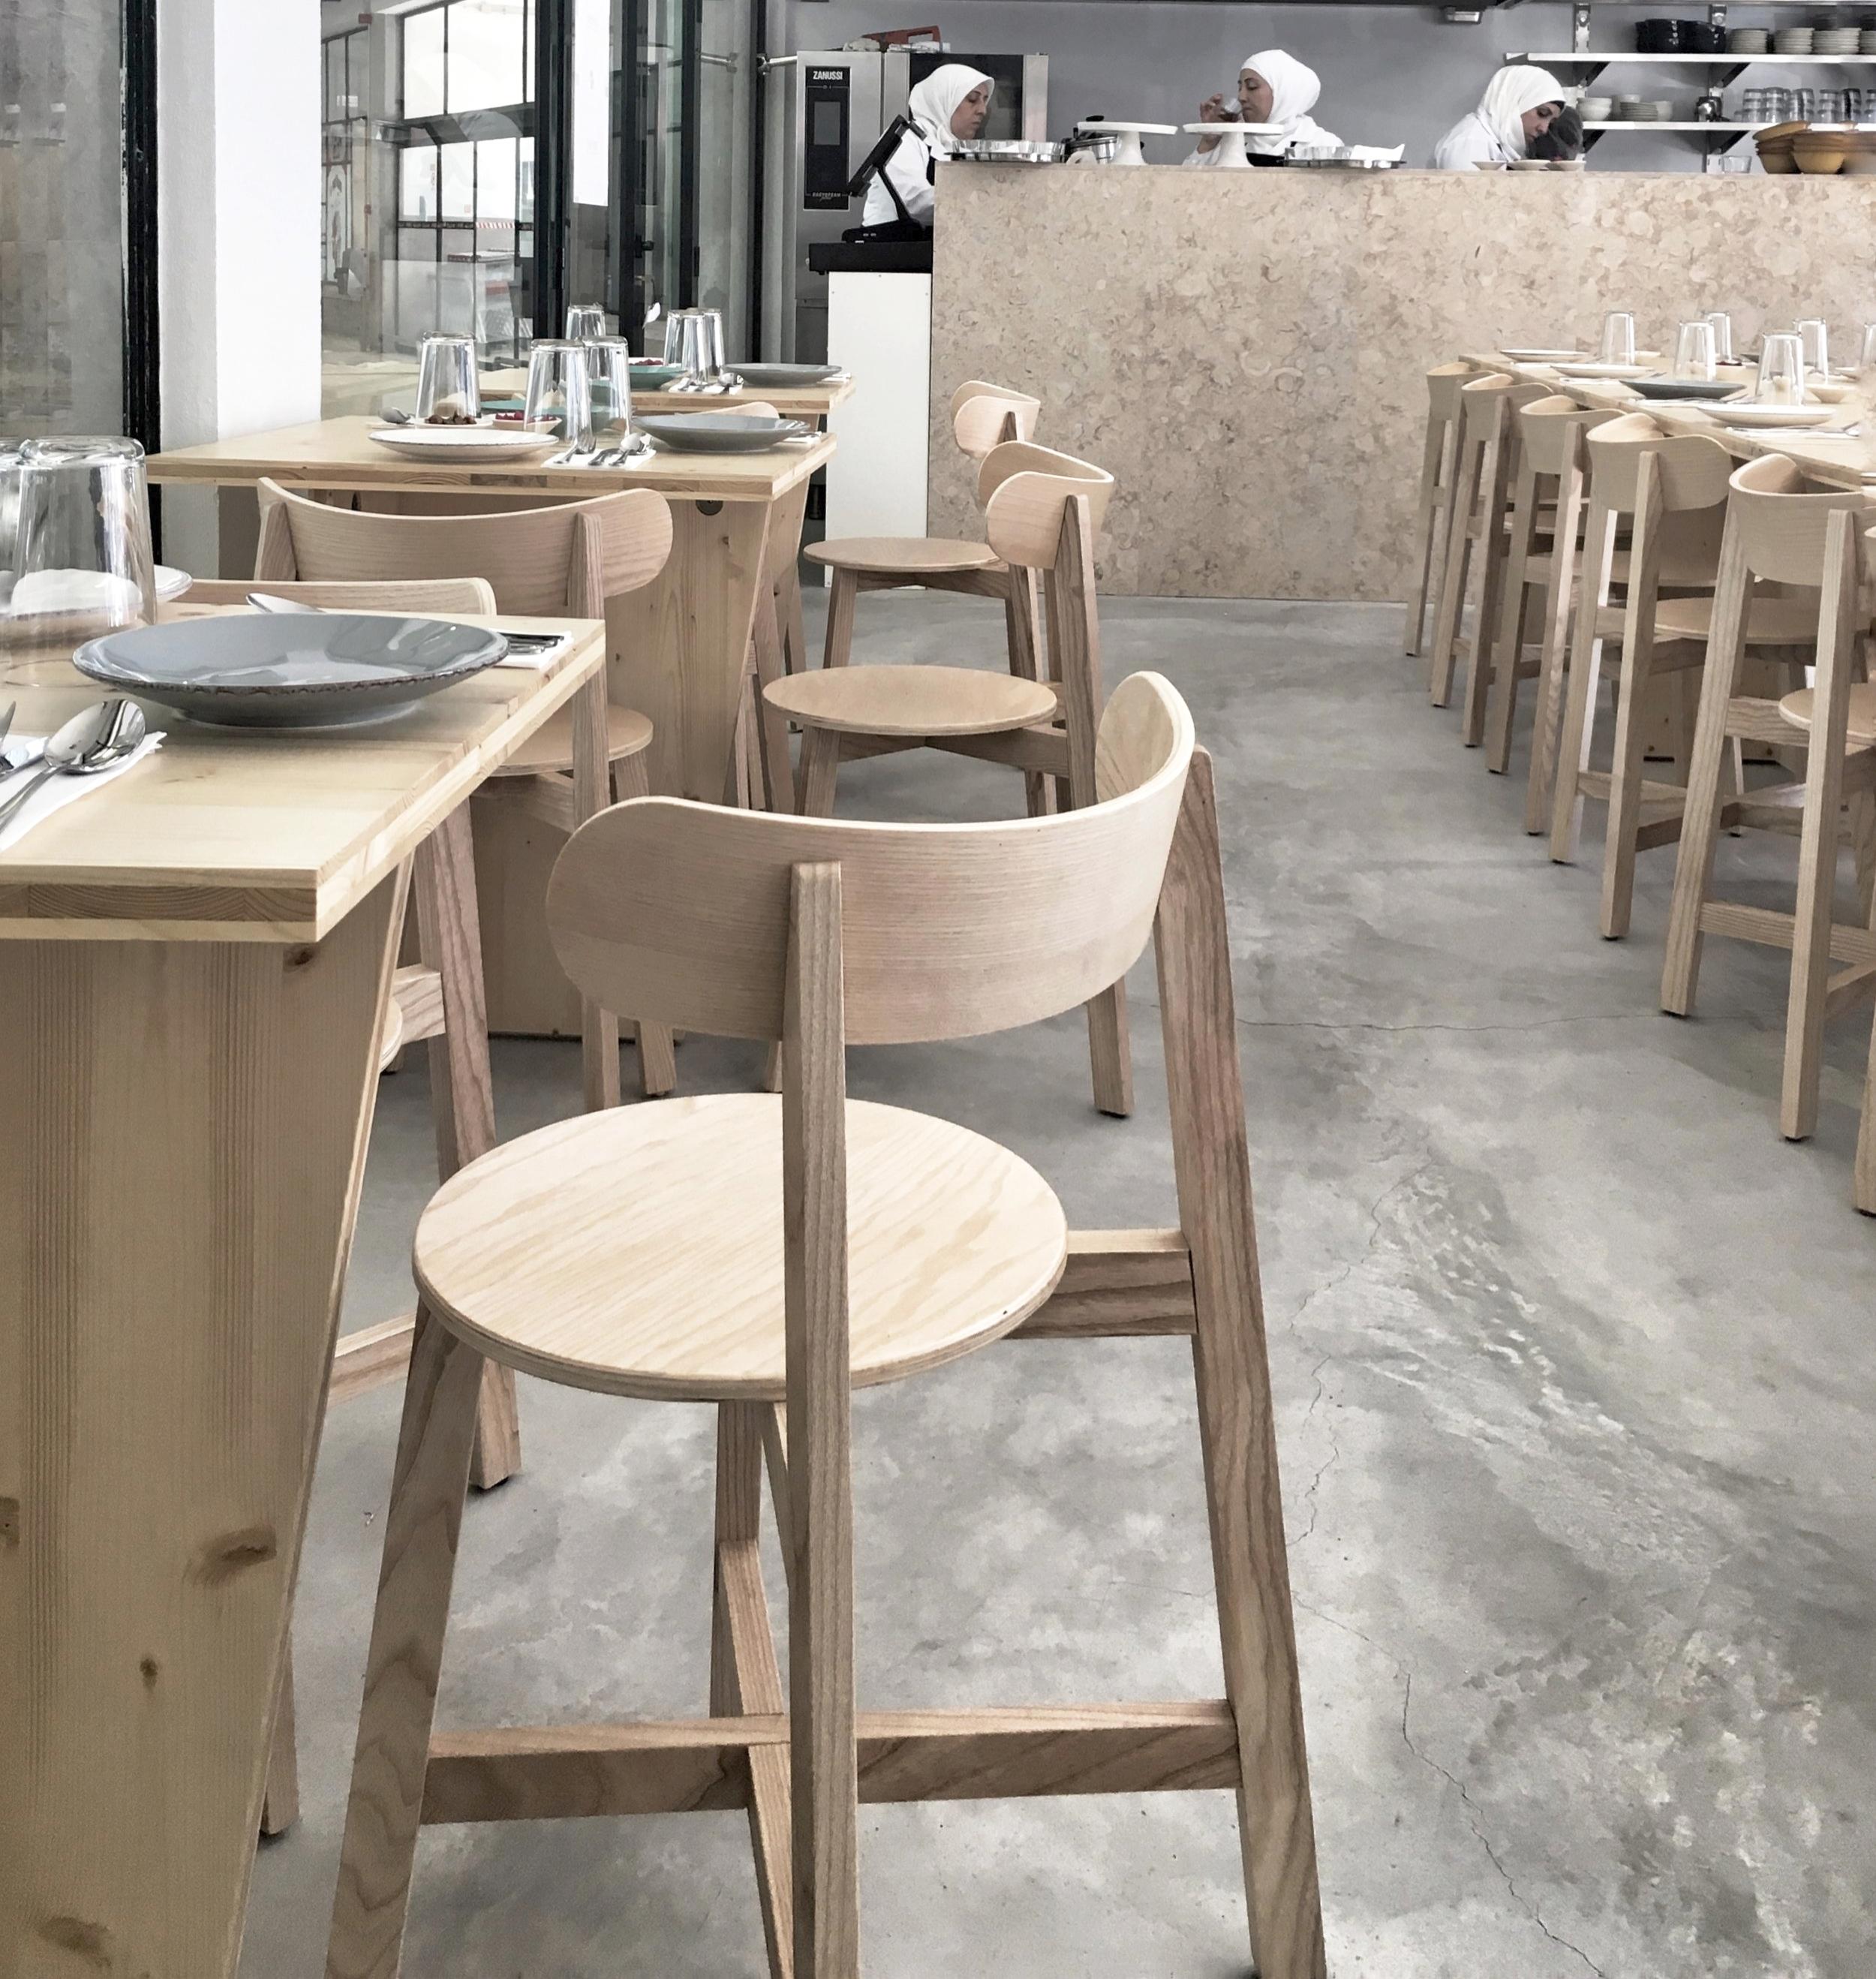 Roda in Mezze restaurant